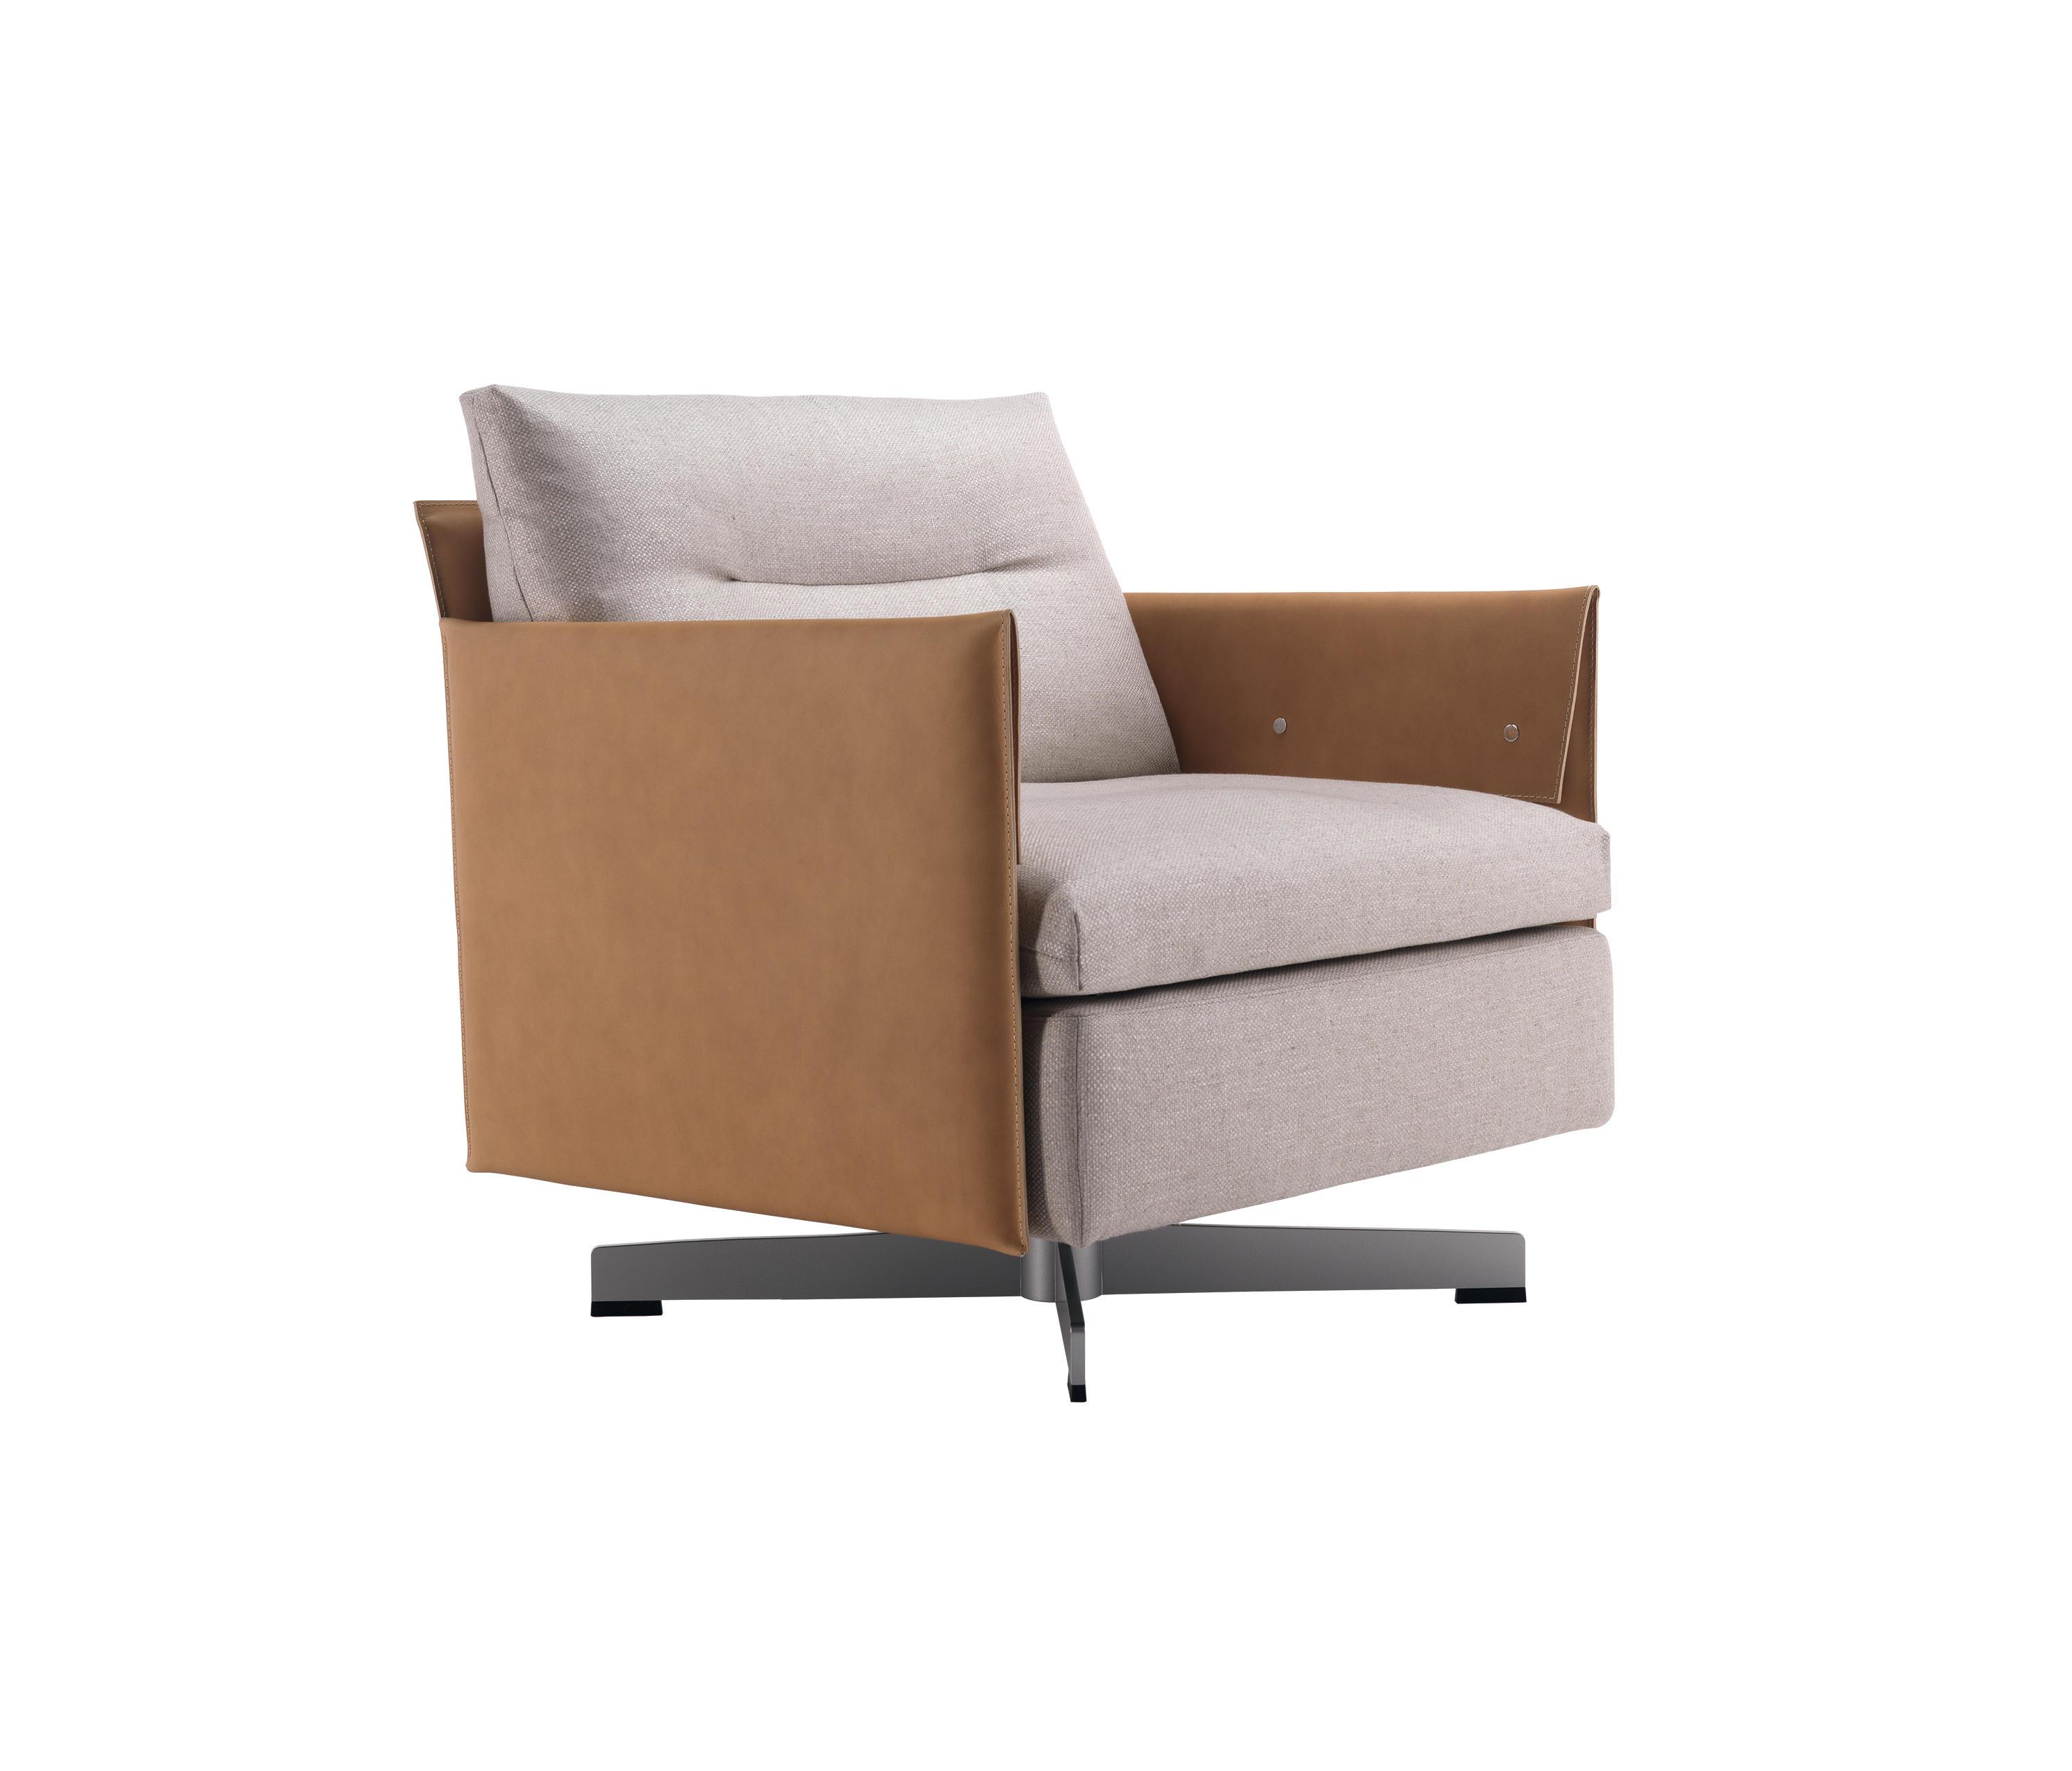 grantorino armchair sessel von poltrona frau architonic. Black Bedroom Furniture Sets. Home Design Ideas